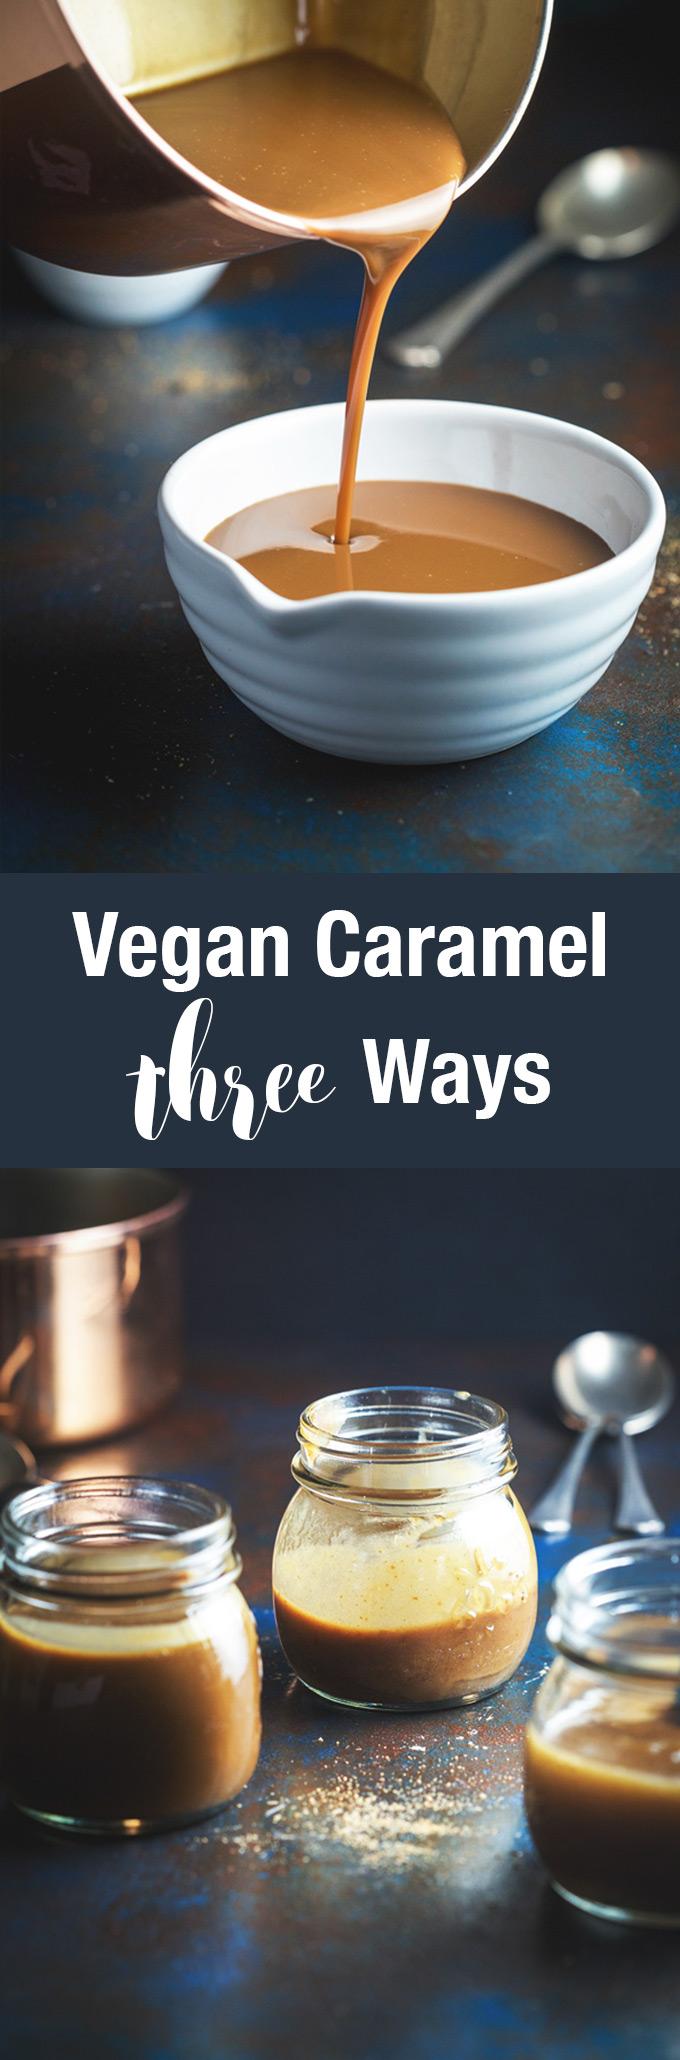 vegan-caramel-three-ways-pin